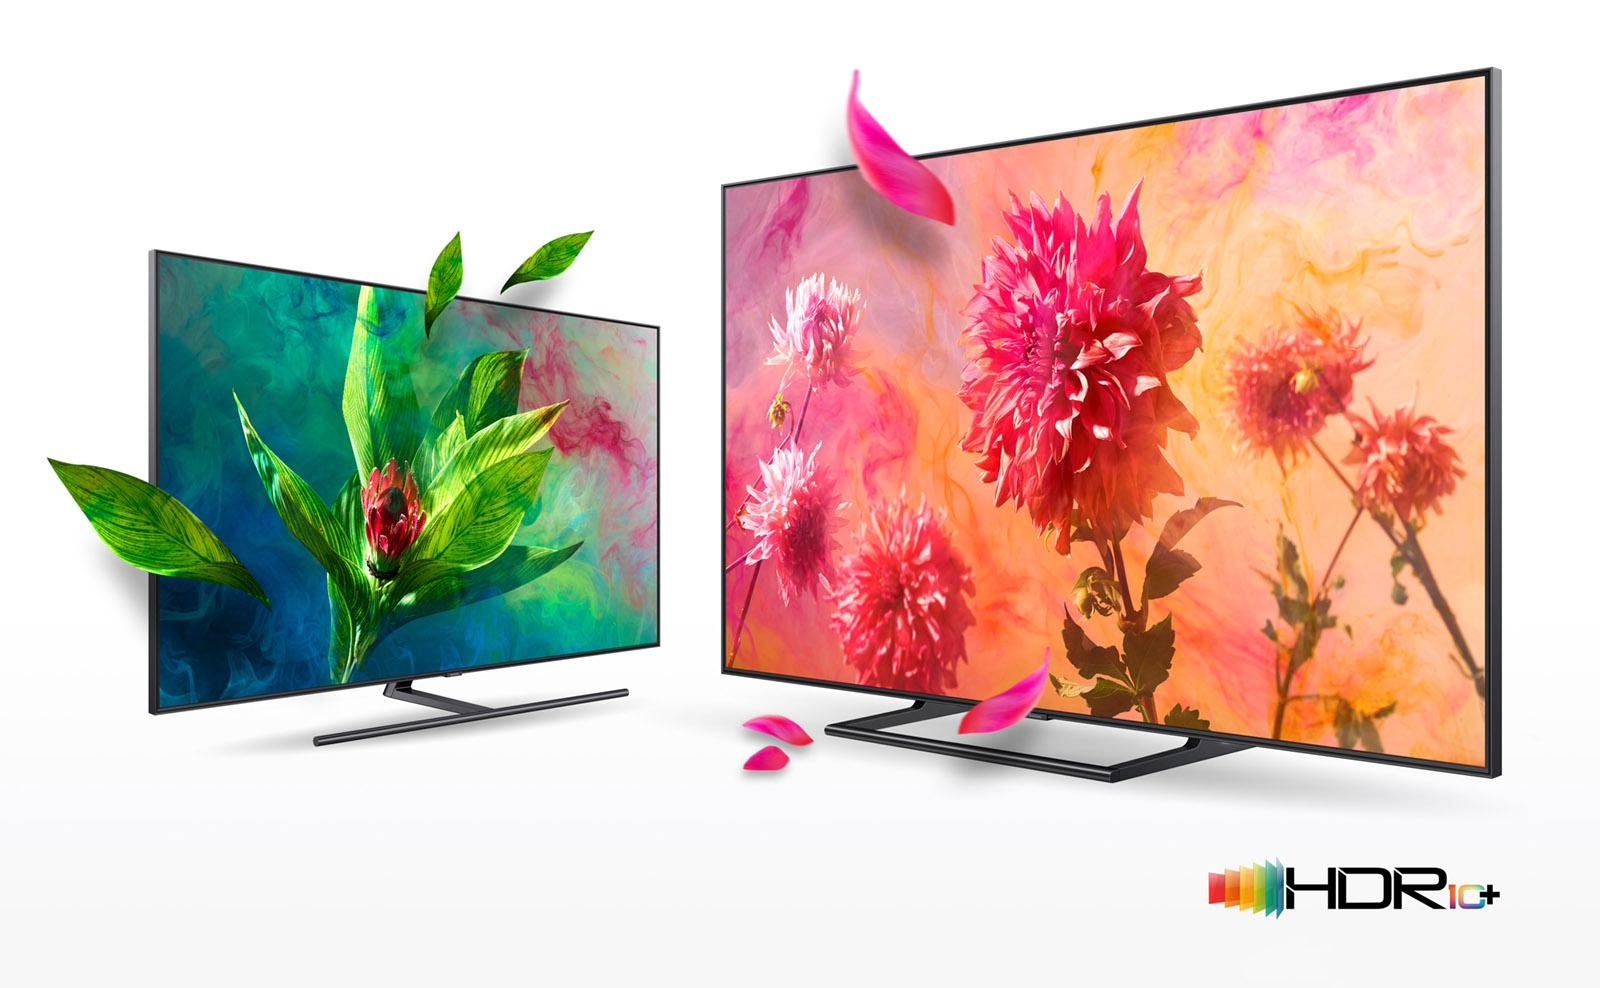 三星和松下部分电视将支持HDR10+